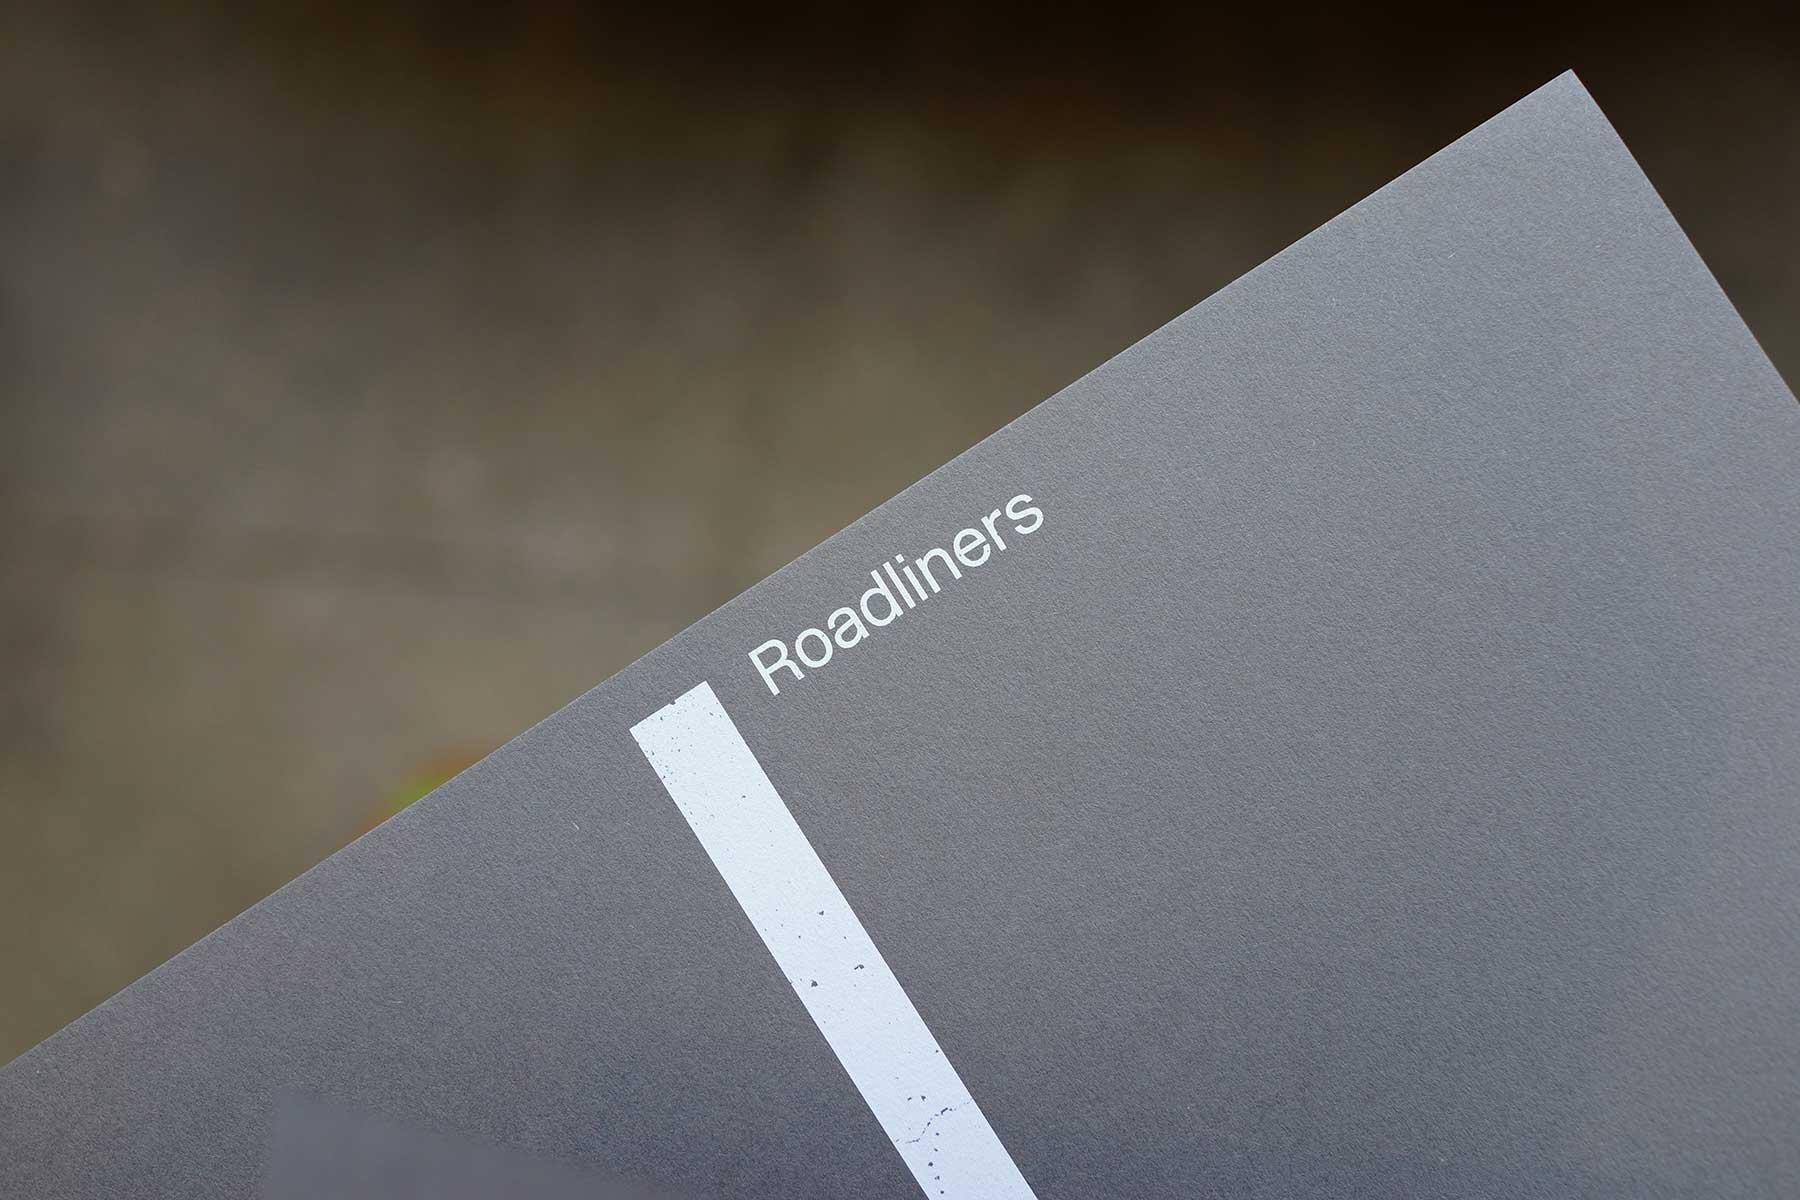 gdfs-ostreet-pretendlovers-roadliners-100